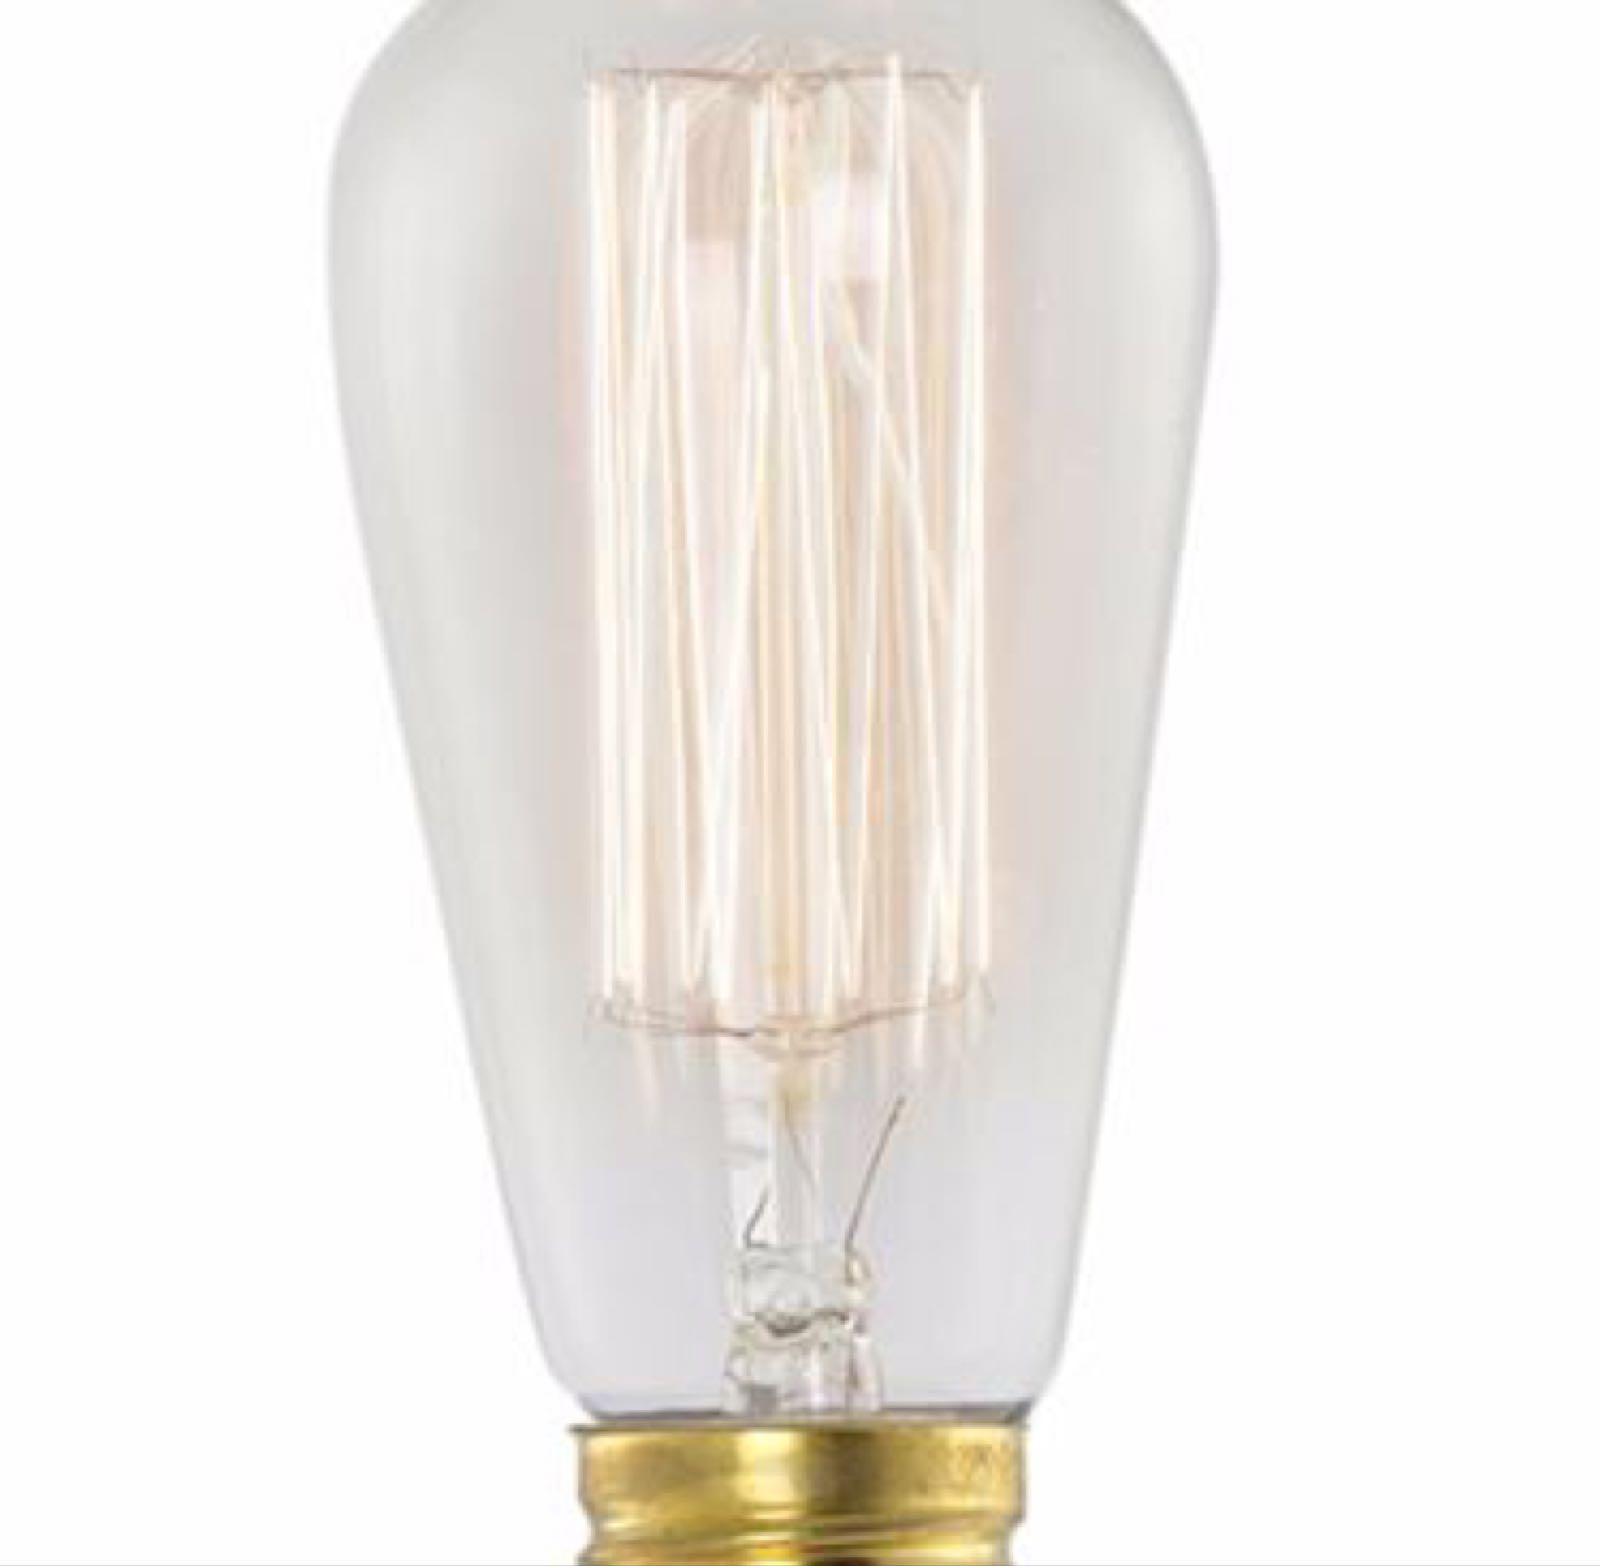 Squirrel bulb E27 screw in